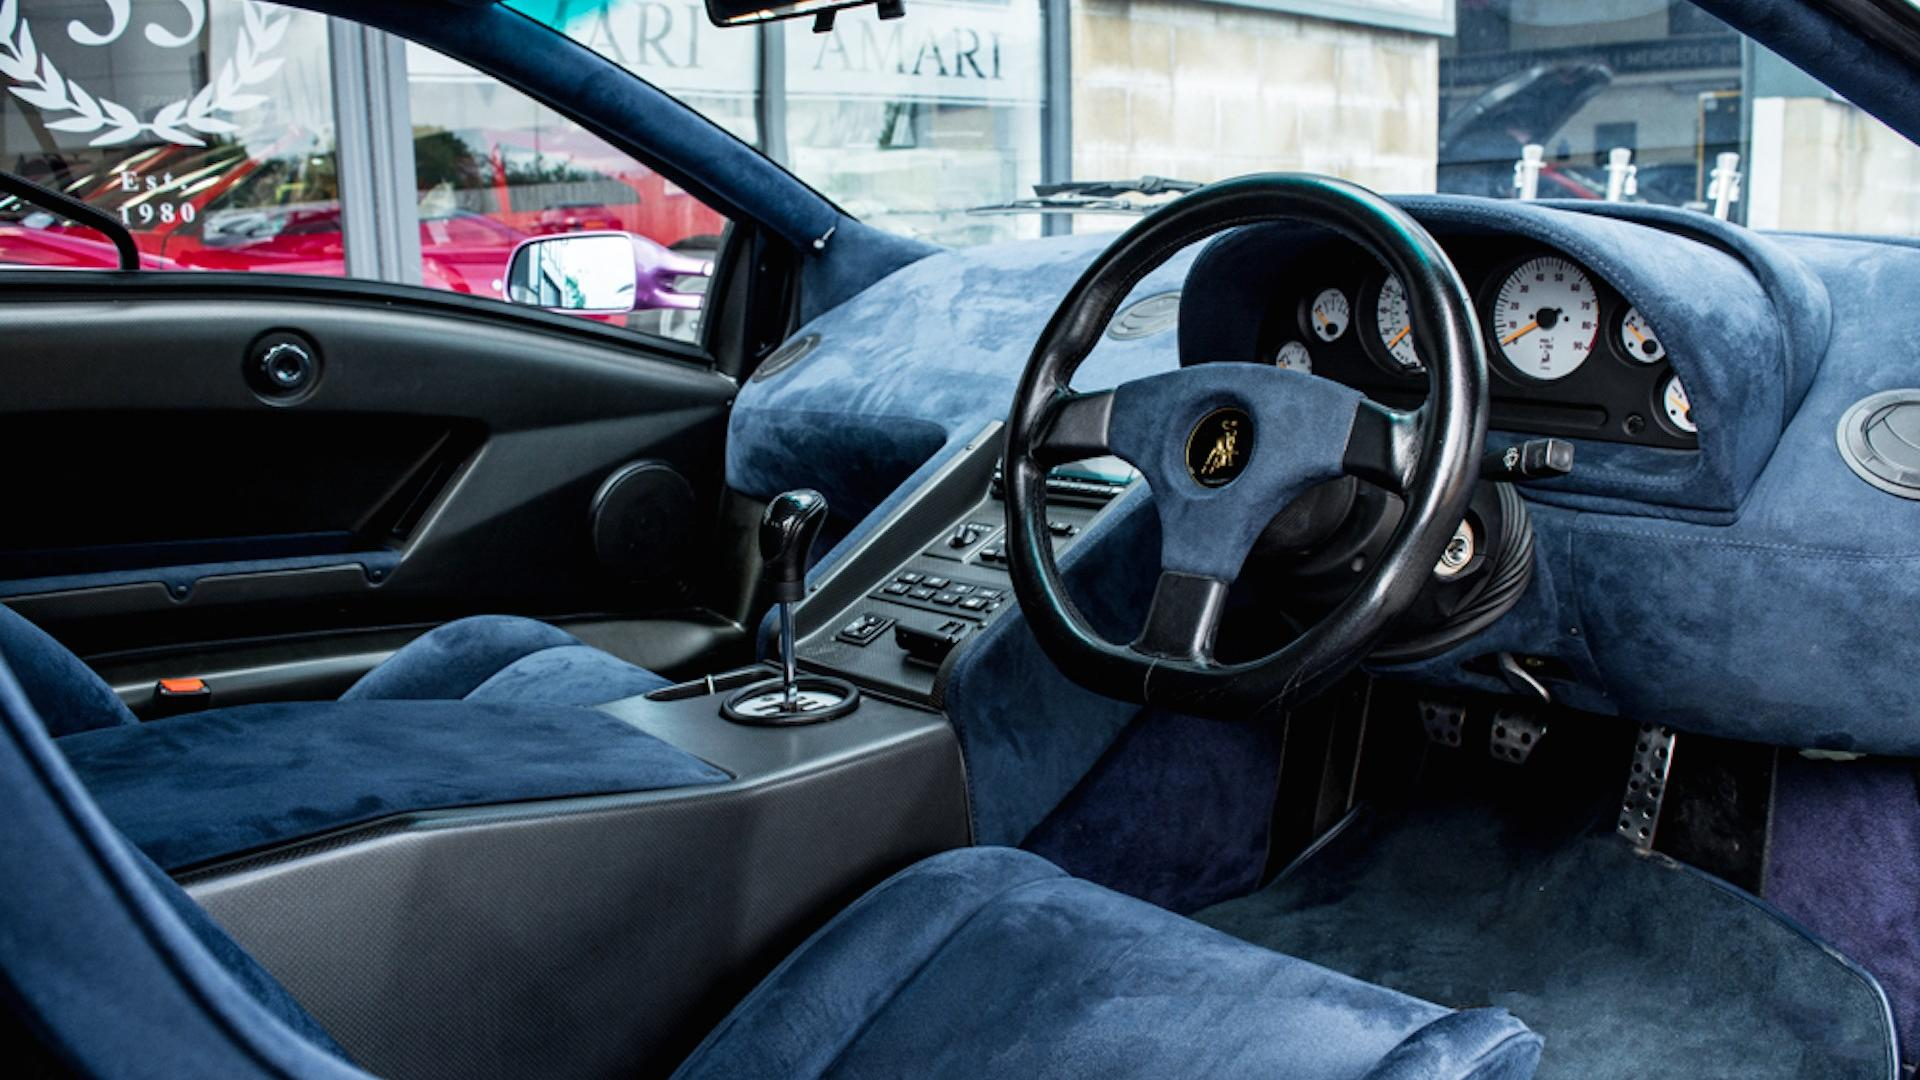 Lamborghini From Jamiroquai S Cosmic Girl Has Astronomical Price